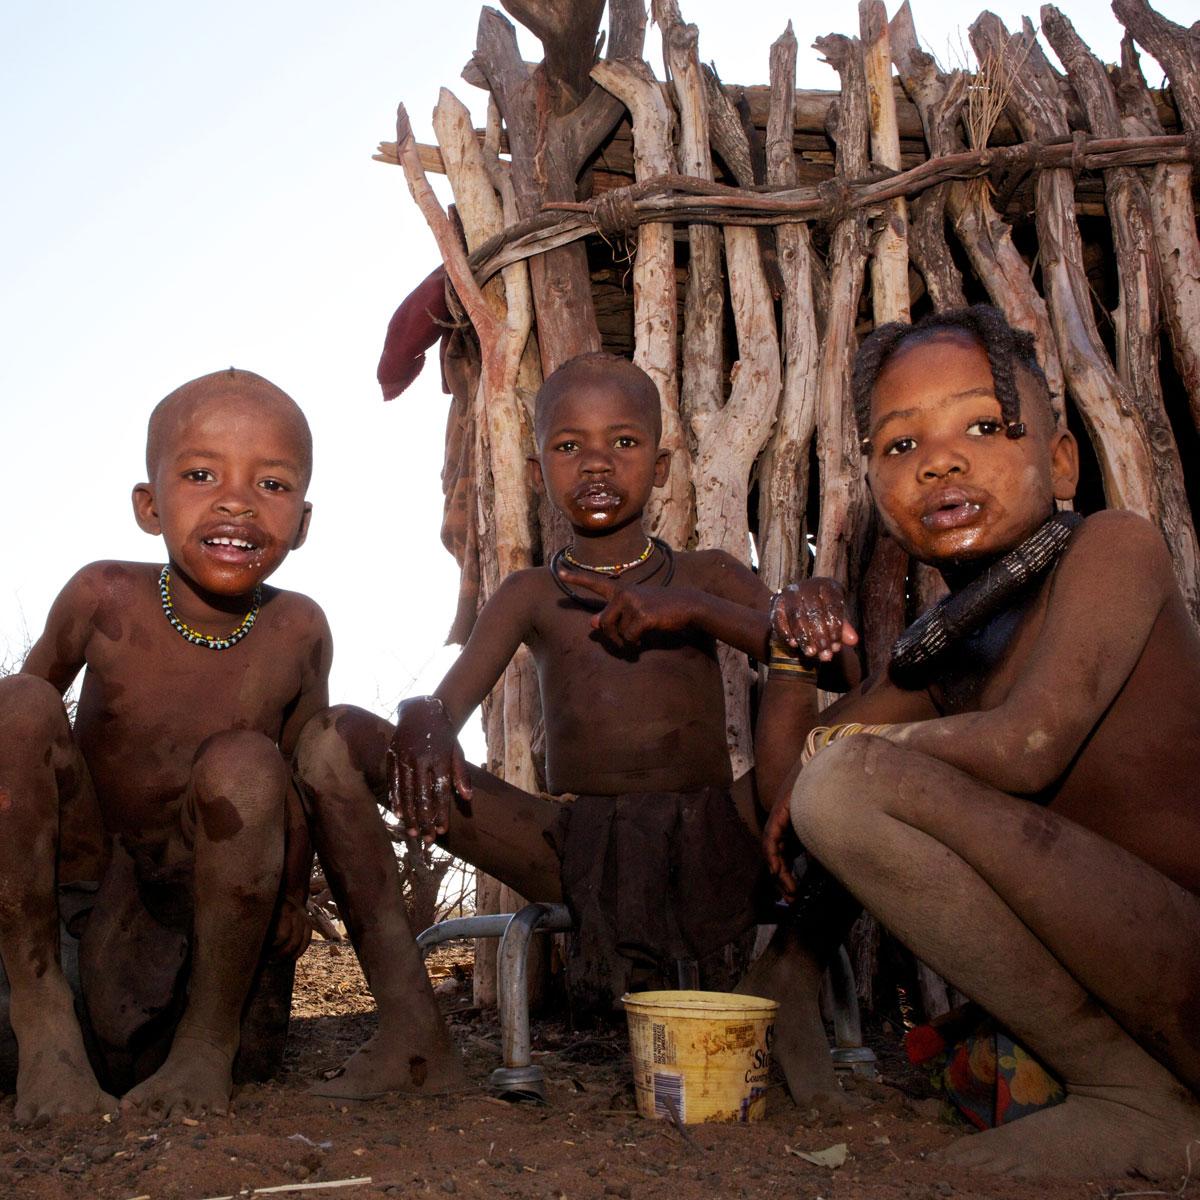 namibia_030_SP